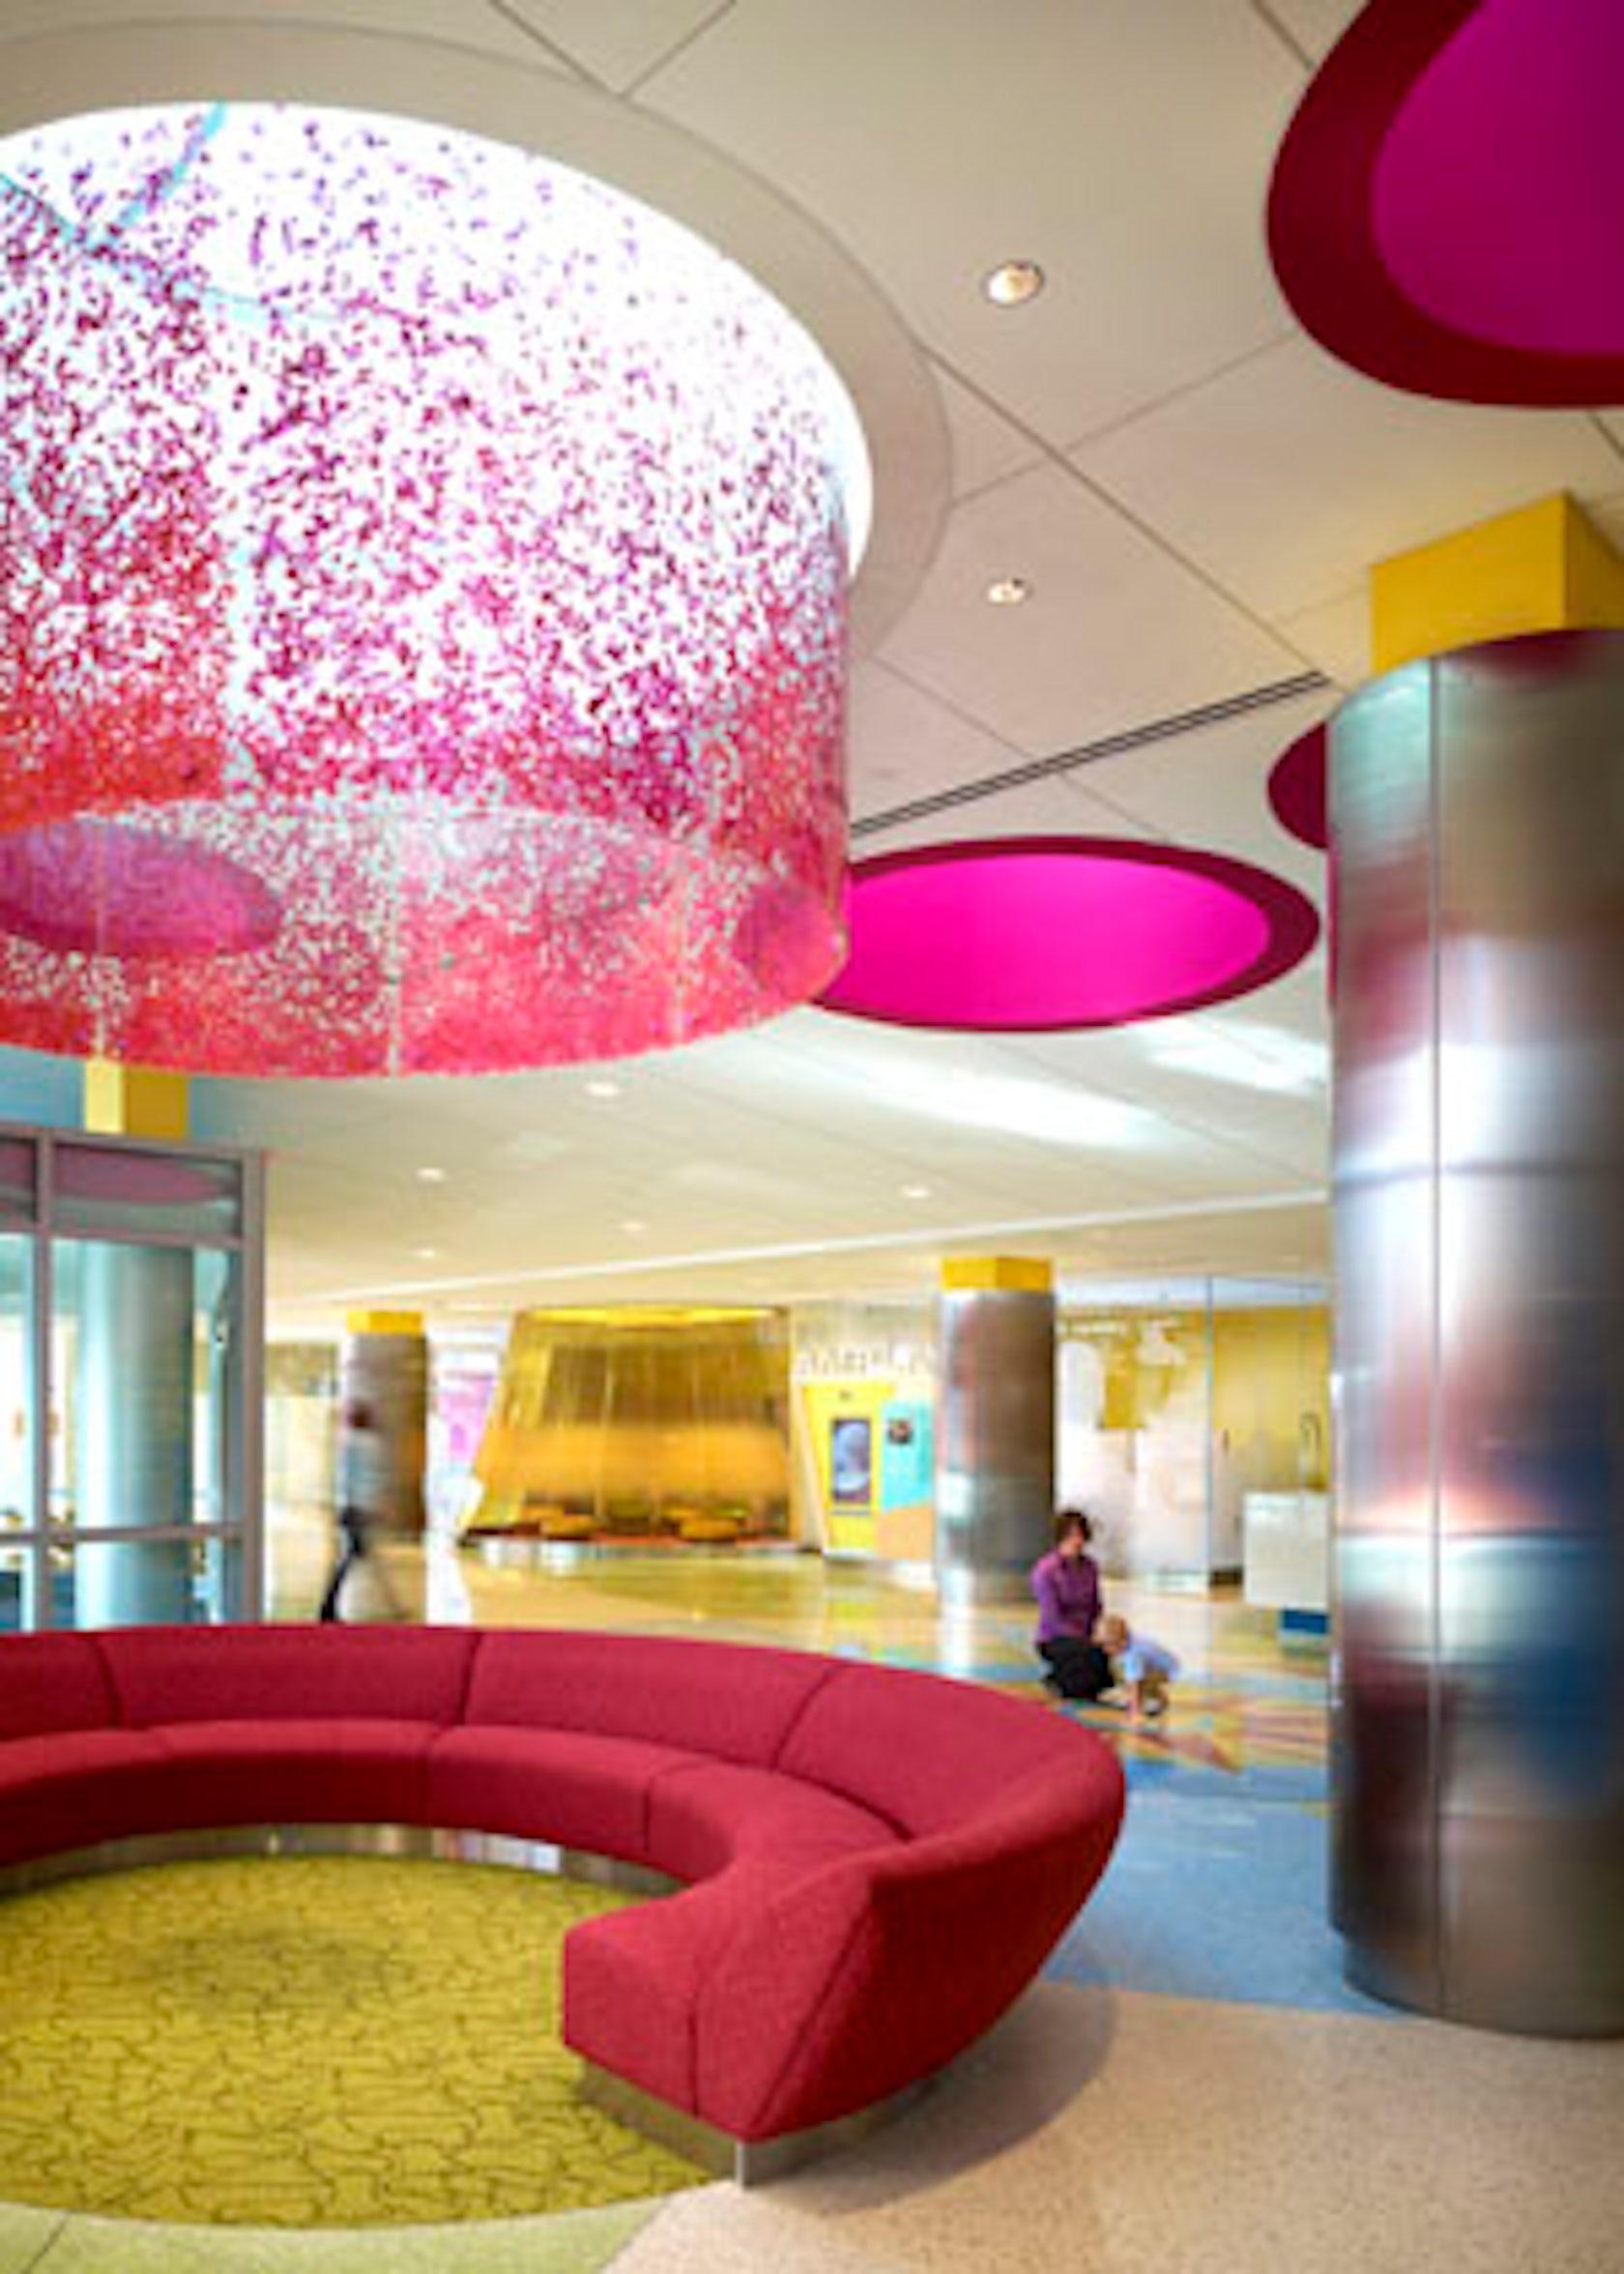 Hospital Room Interior Design: University Of Minnesota Amplatz Children's Hospital New